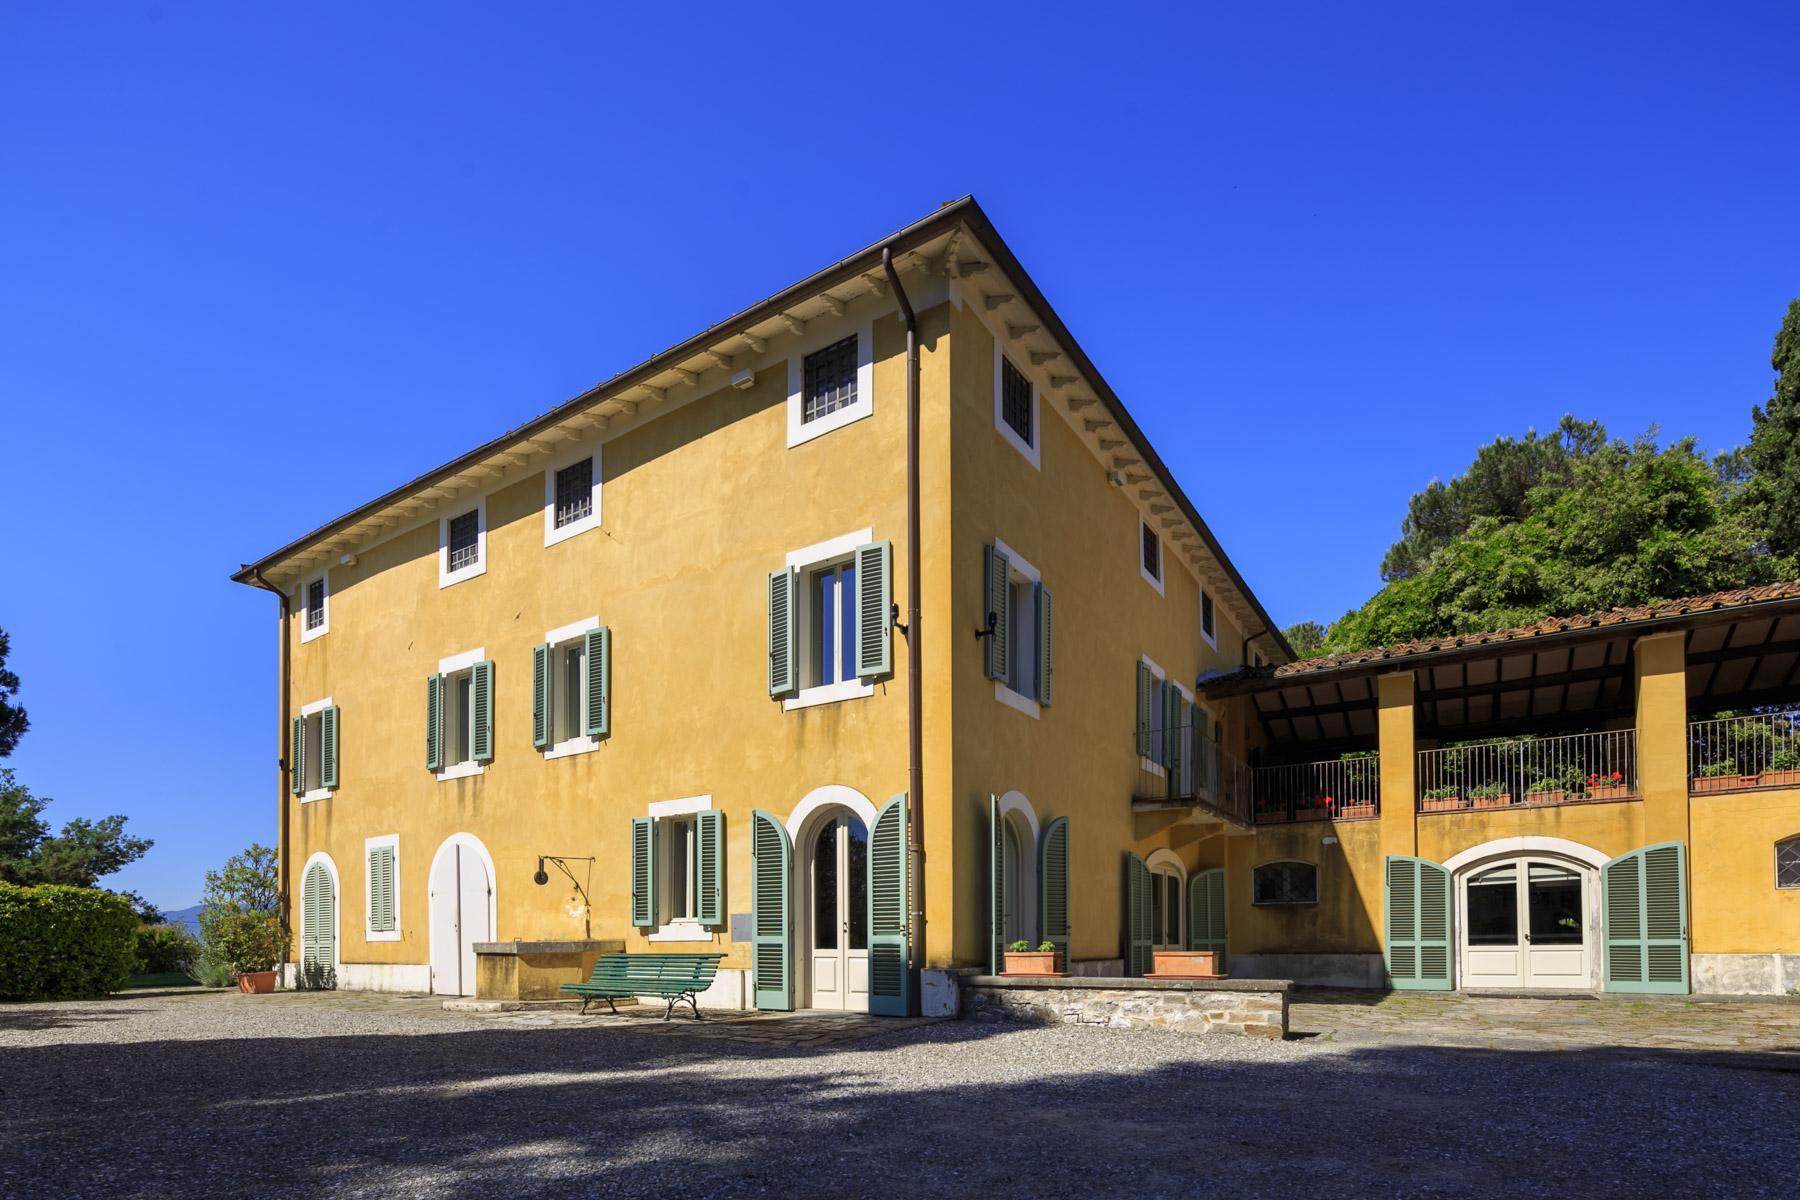 Elegant villa on the Tuscan hills - 3